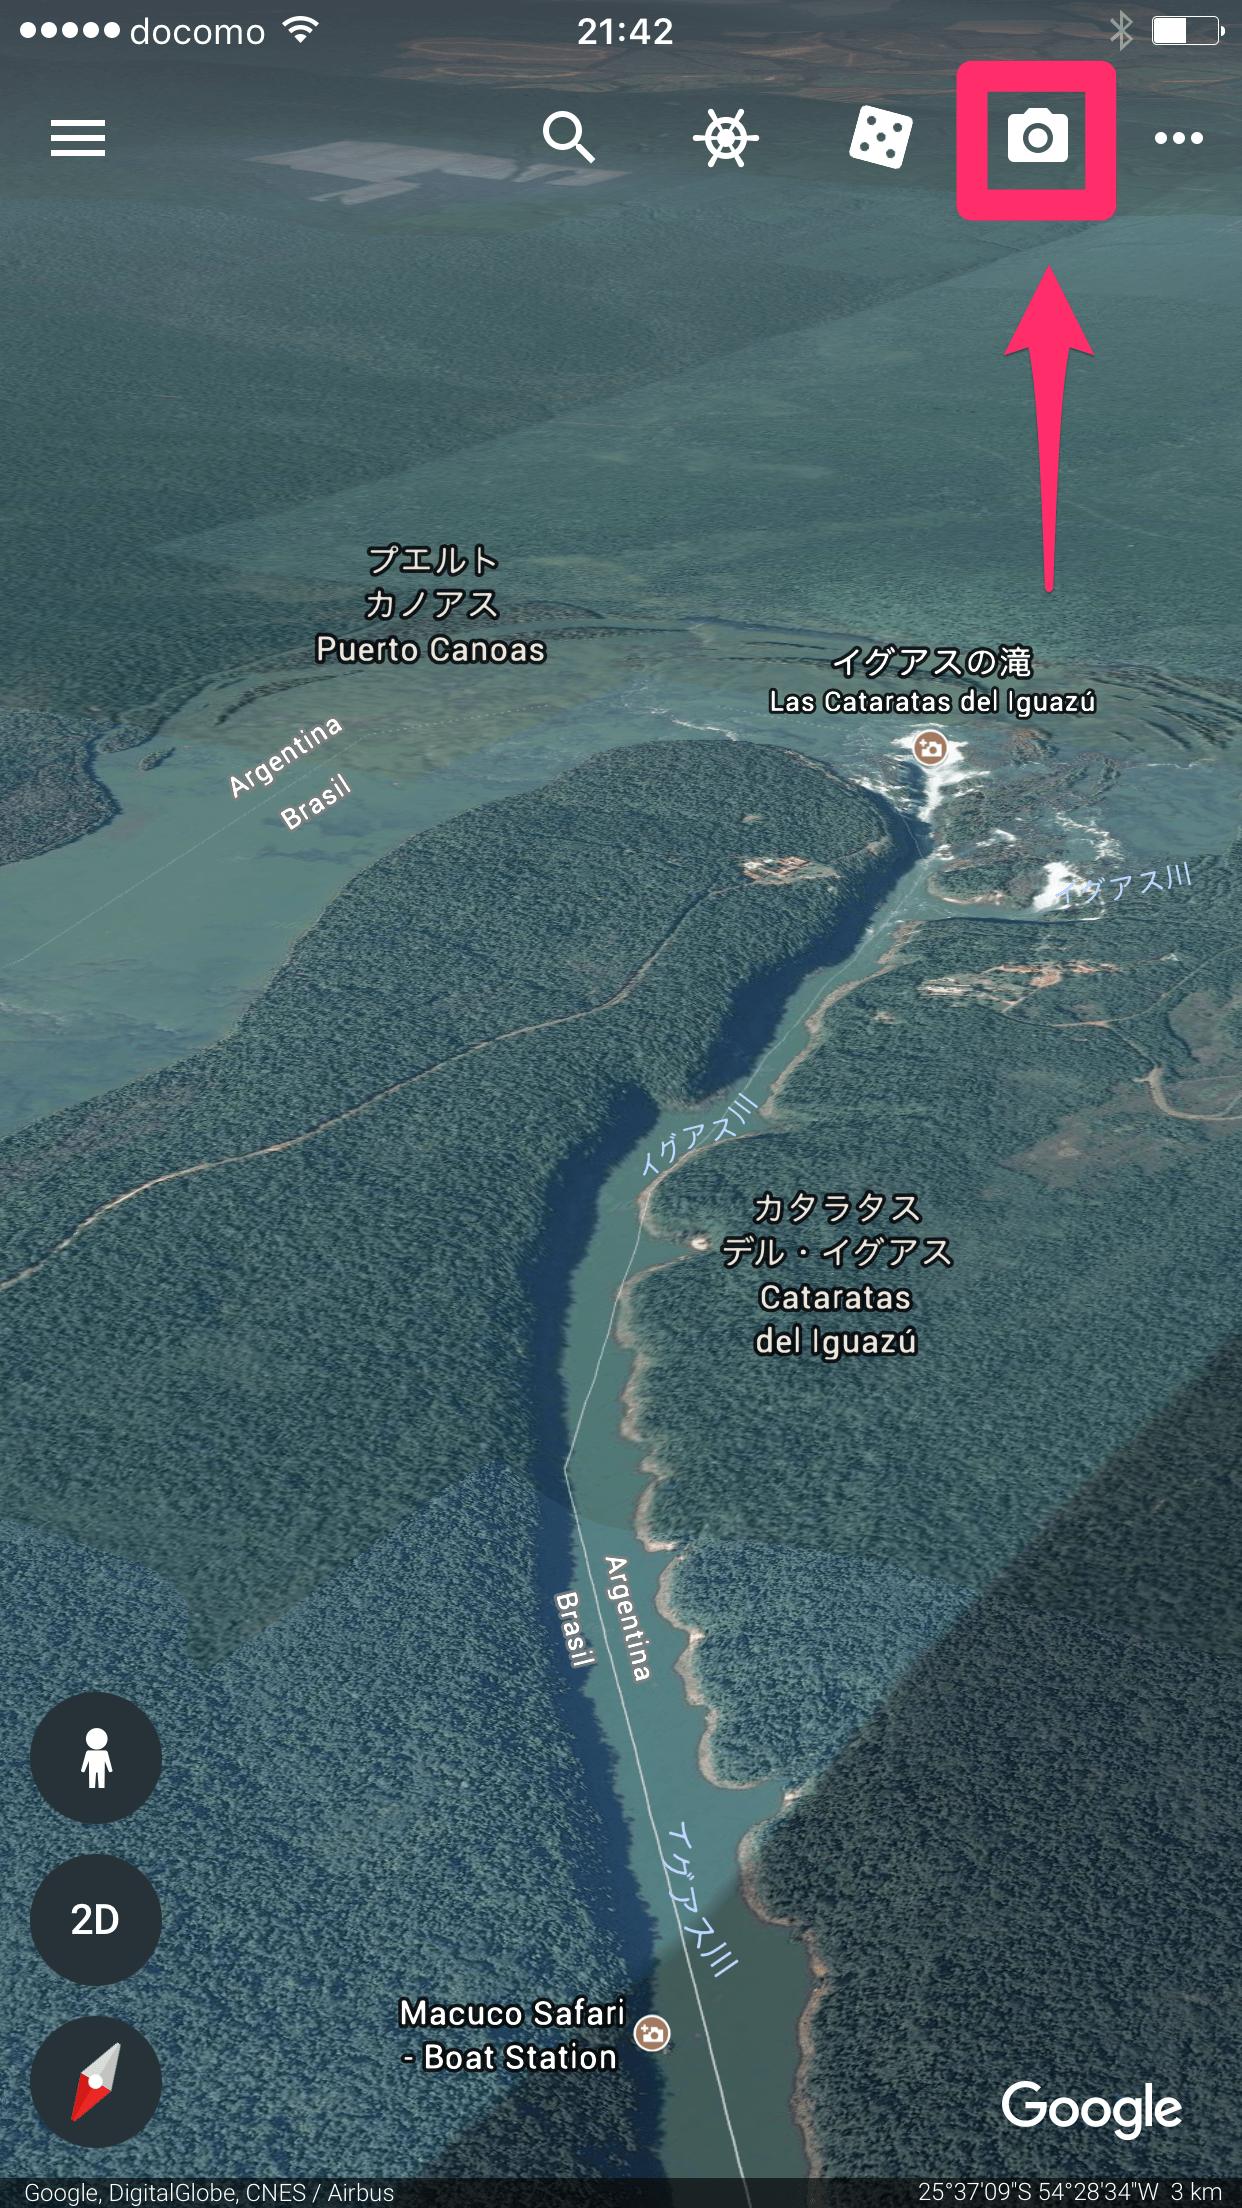 【Google Earth】夏の旅行の下調べにも! 大幅アップデートされたアプリで世界中のスポットを探検